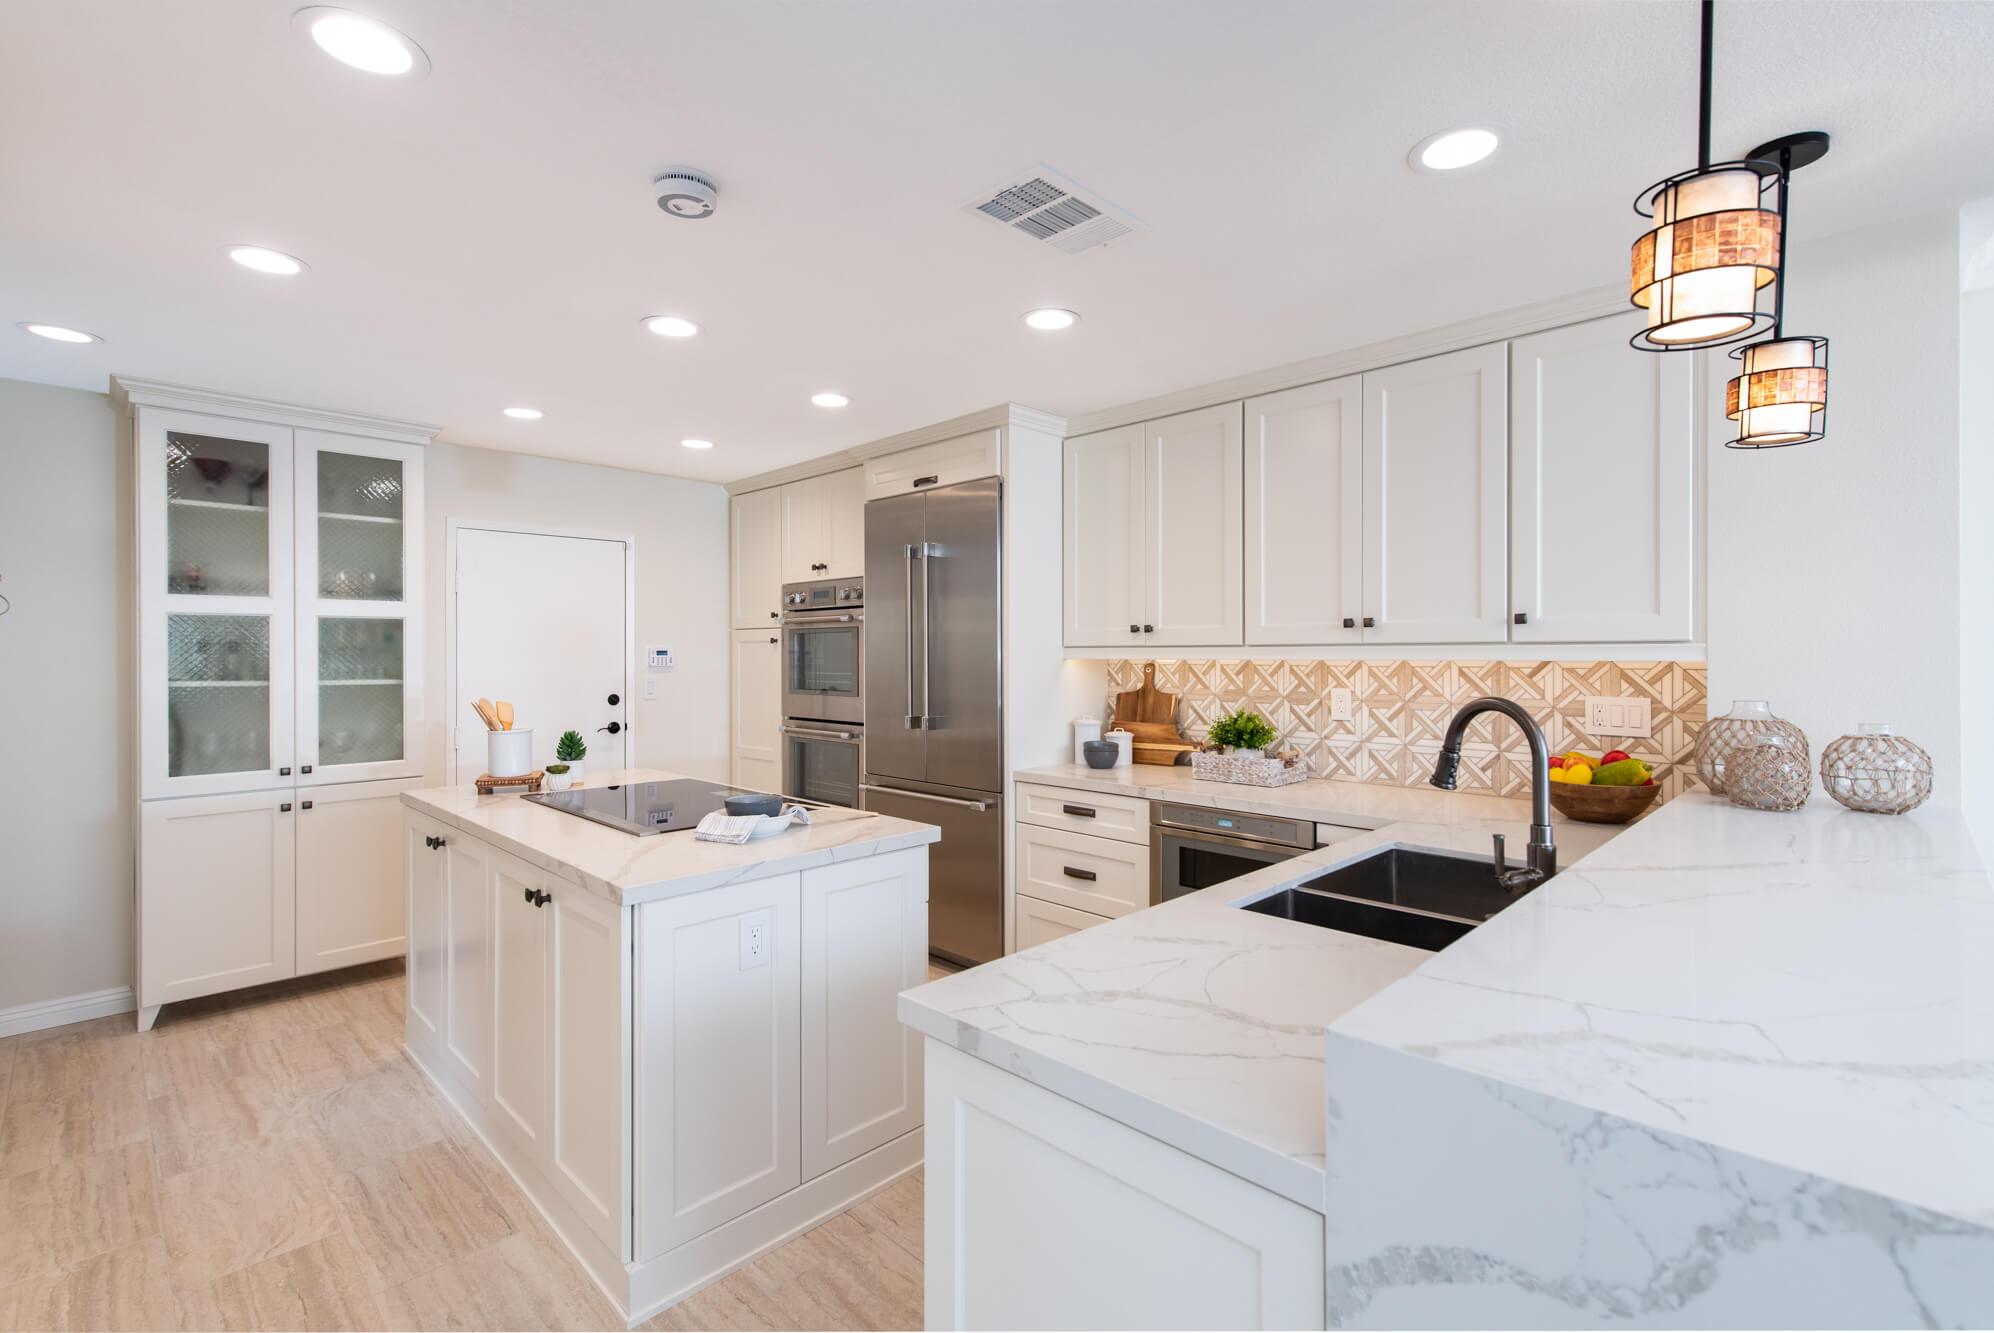 Newport Beach Kitchen Remodel With Island